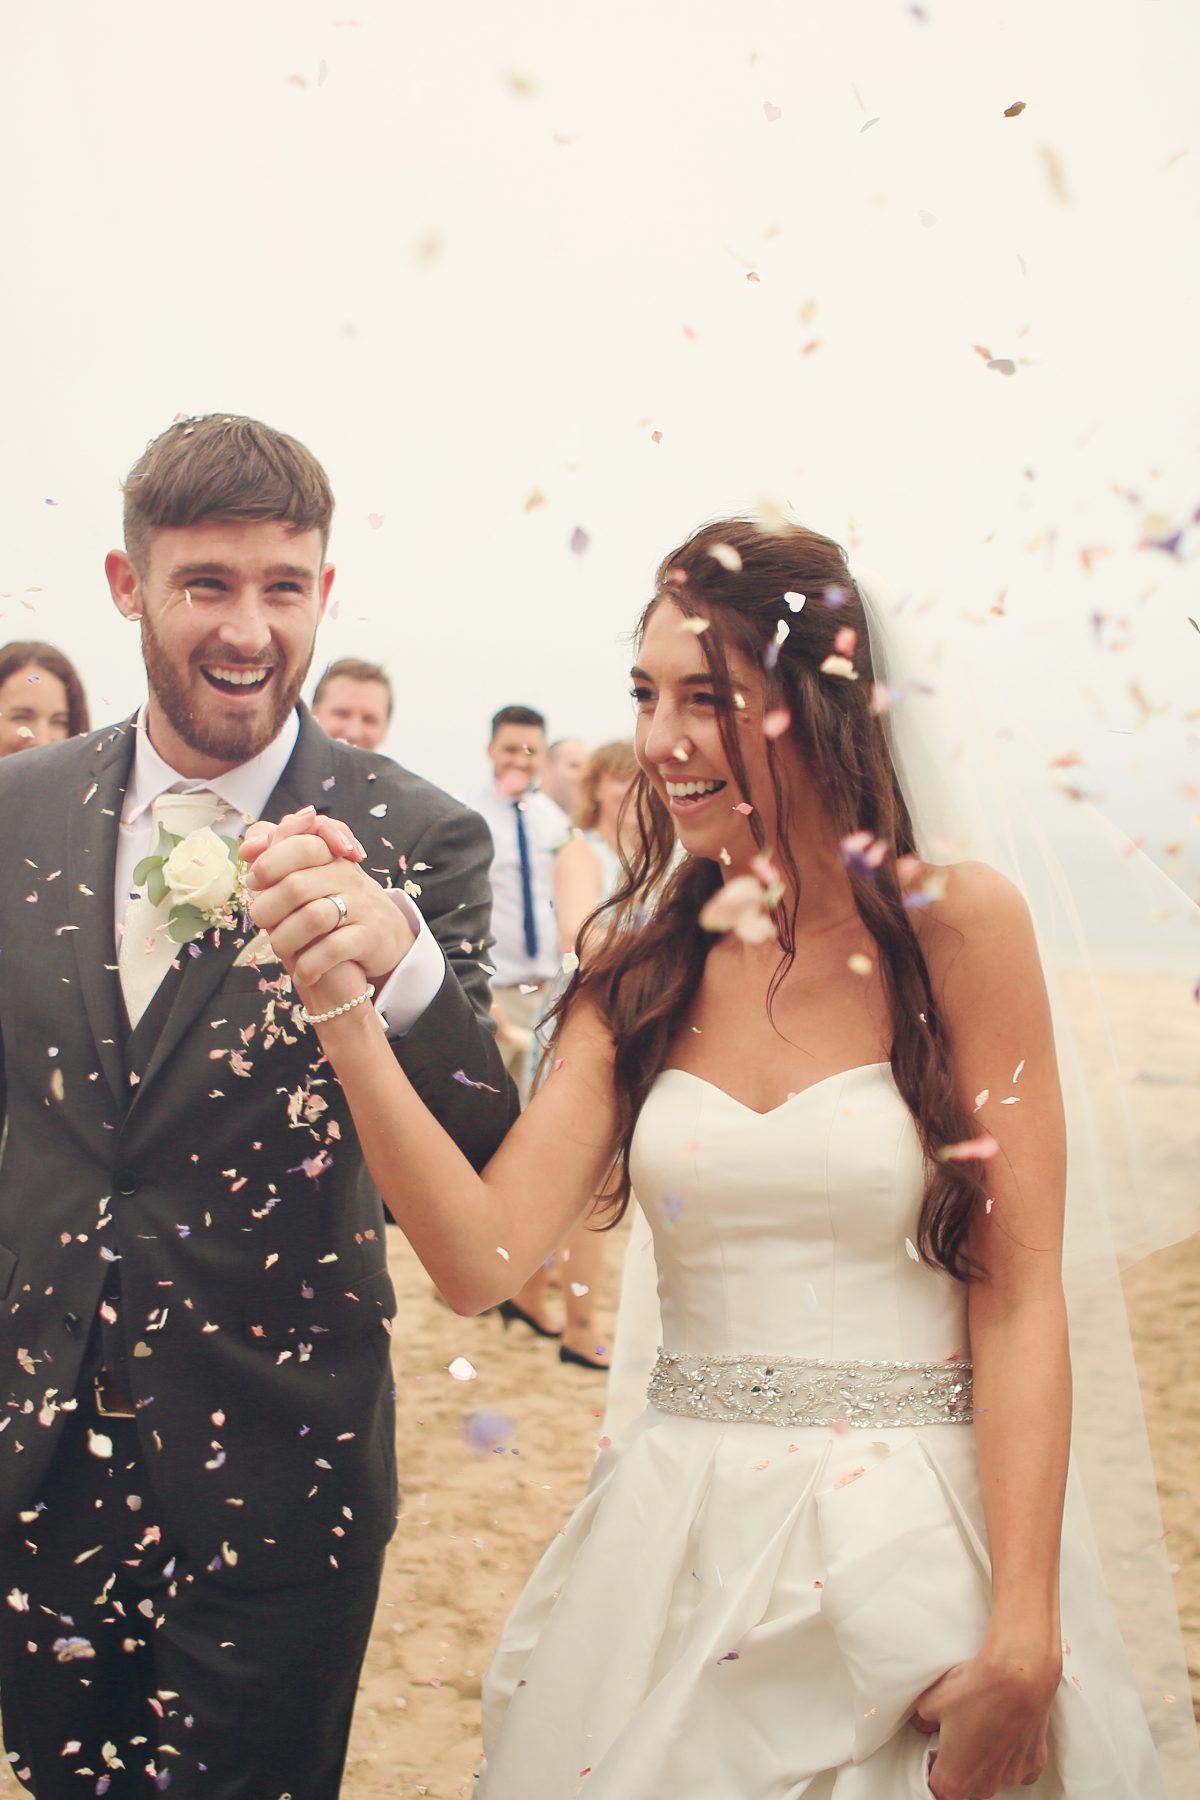 Confetti on bride and groom on beach.